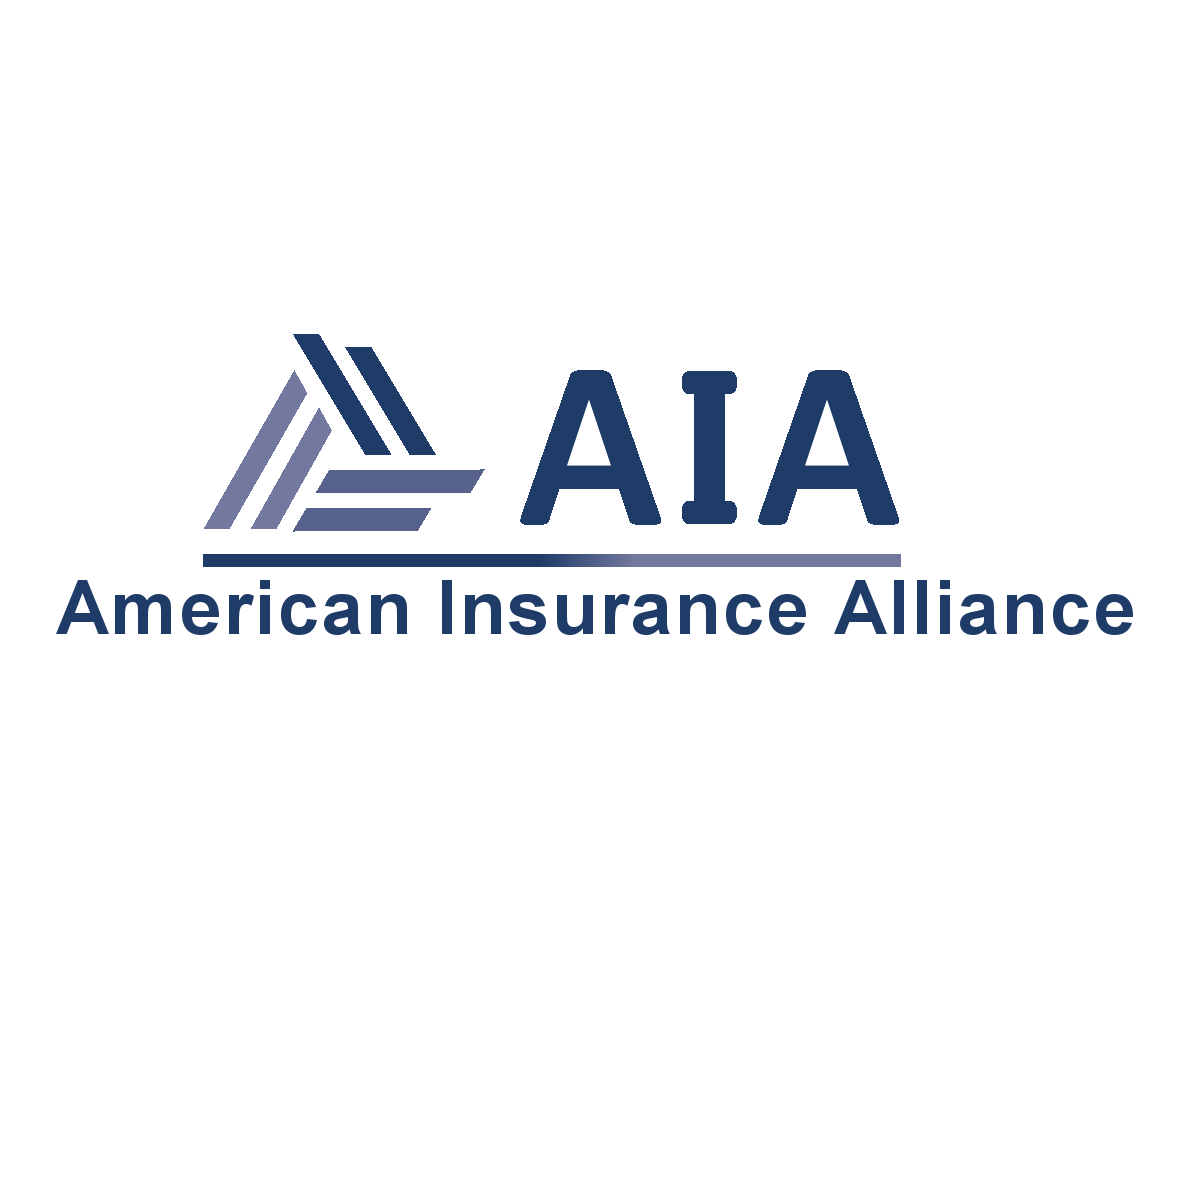 American Insurance Alliance